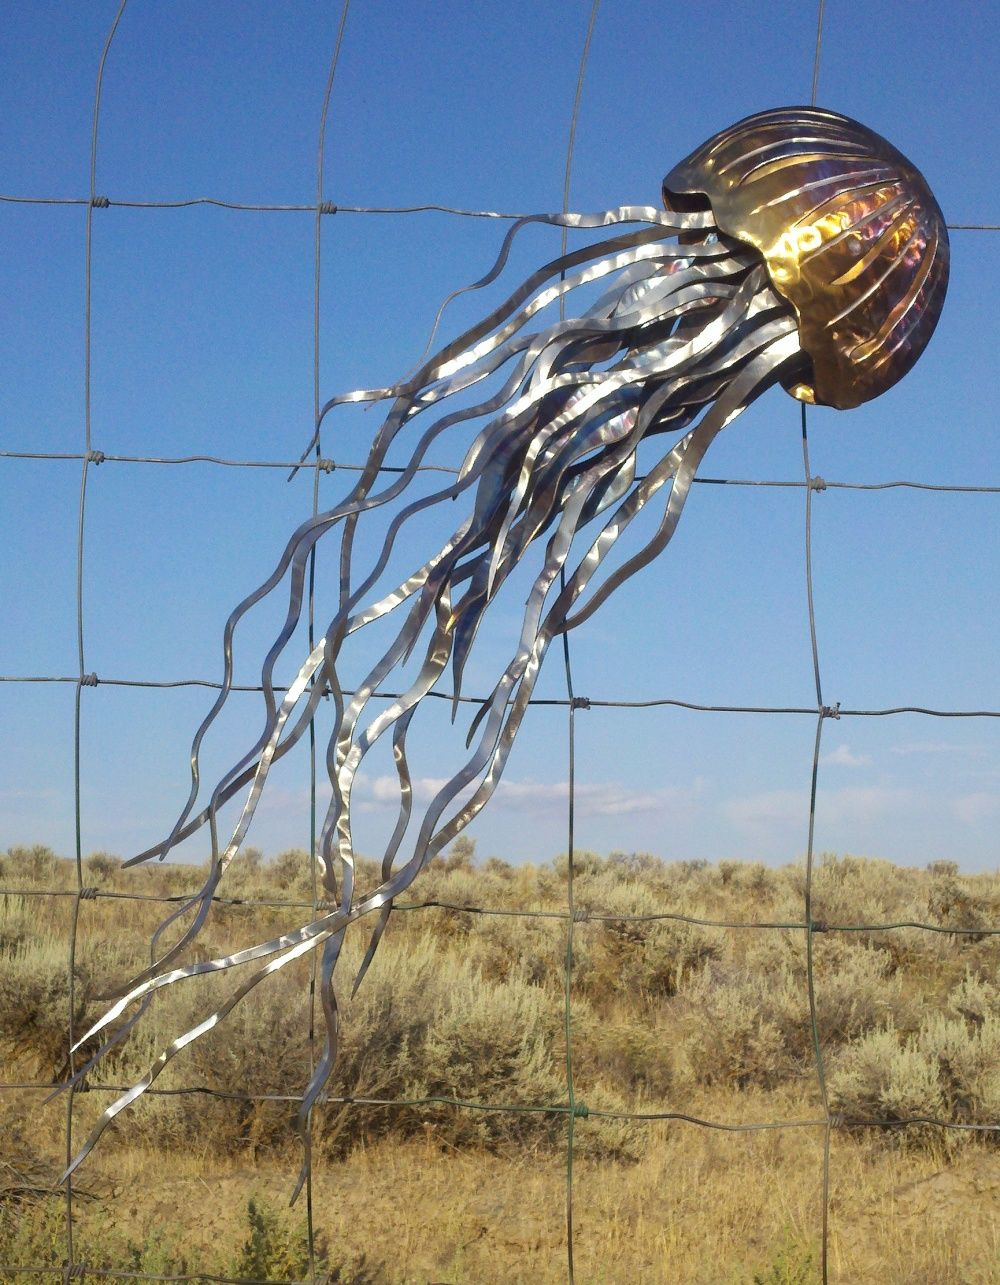 metal jellyfish sculpture - Google Search | Artwork Inspiration ...